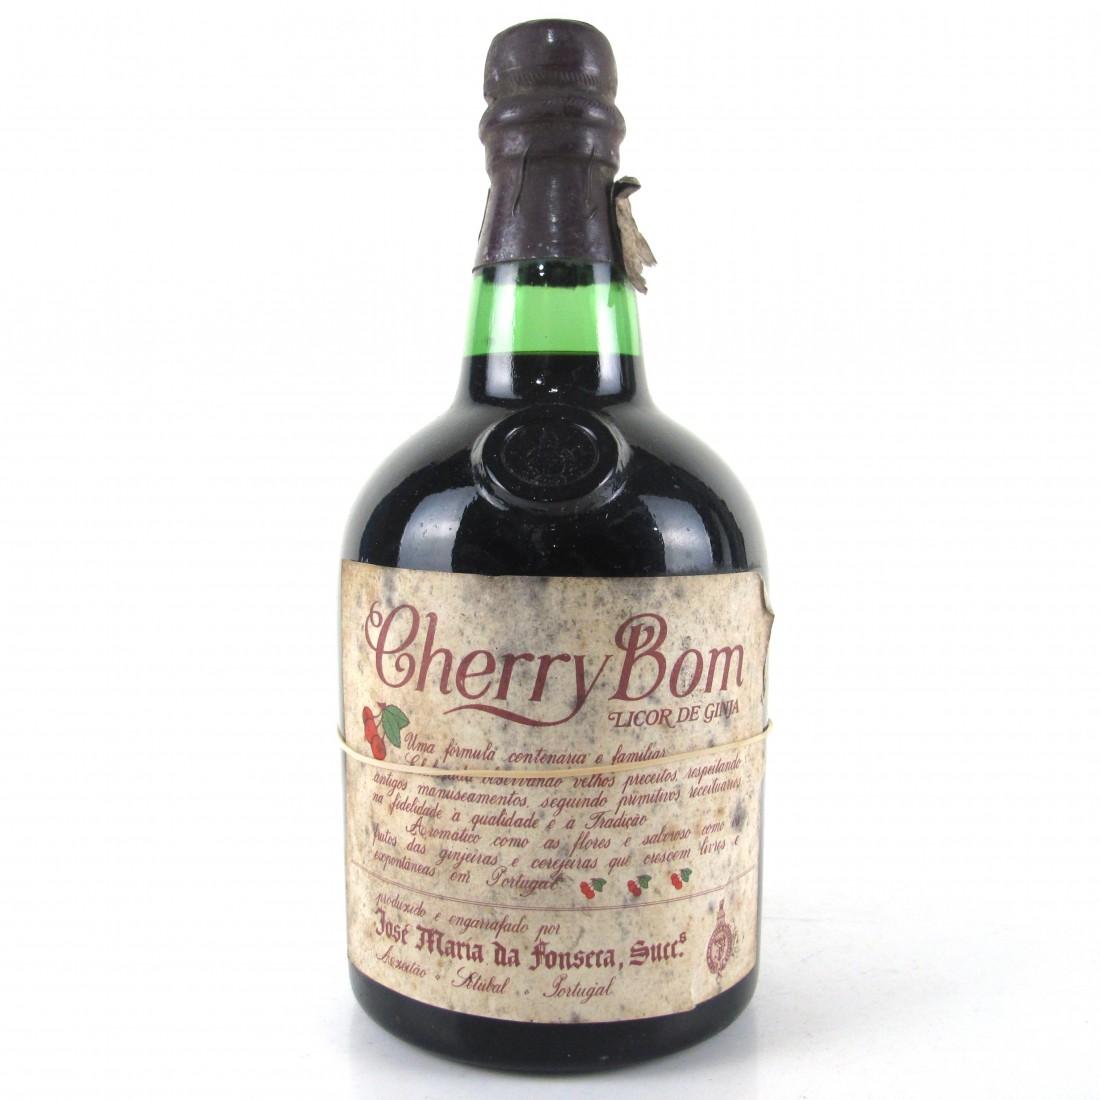 Cherry Bom Licor de Ginja Circa 1960s